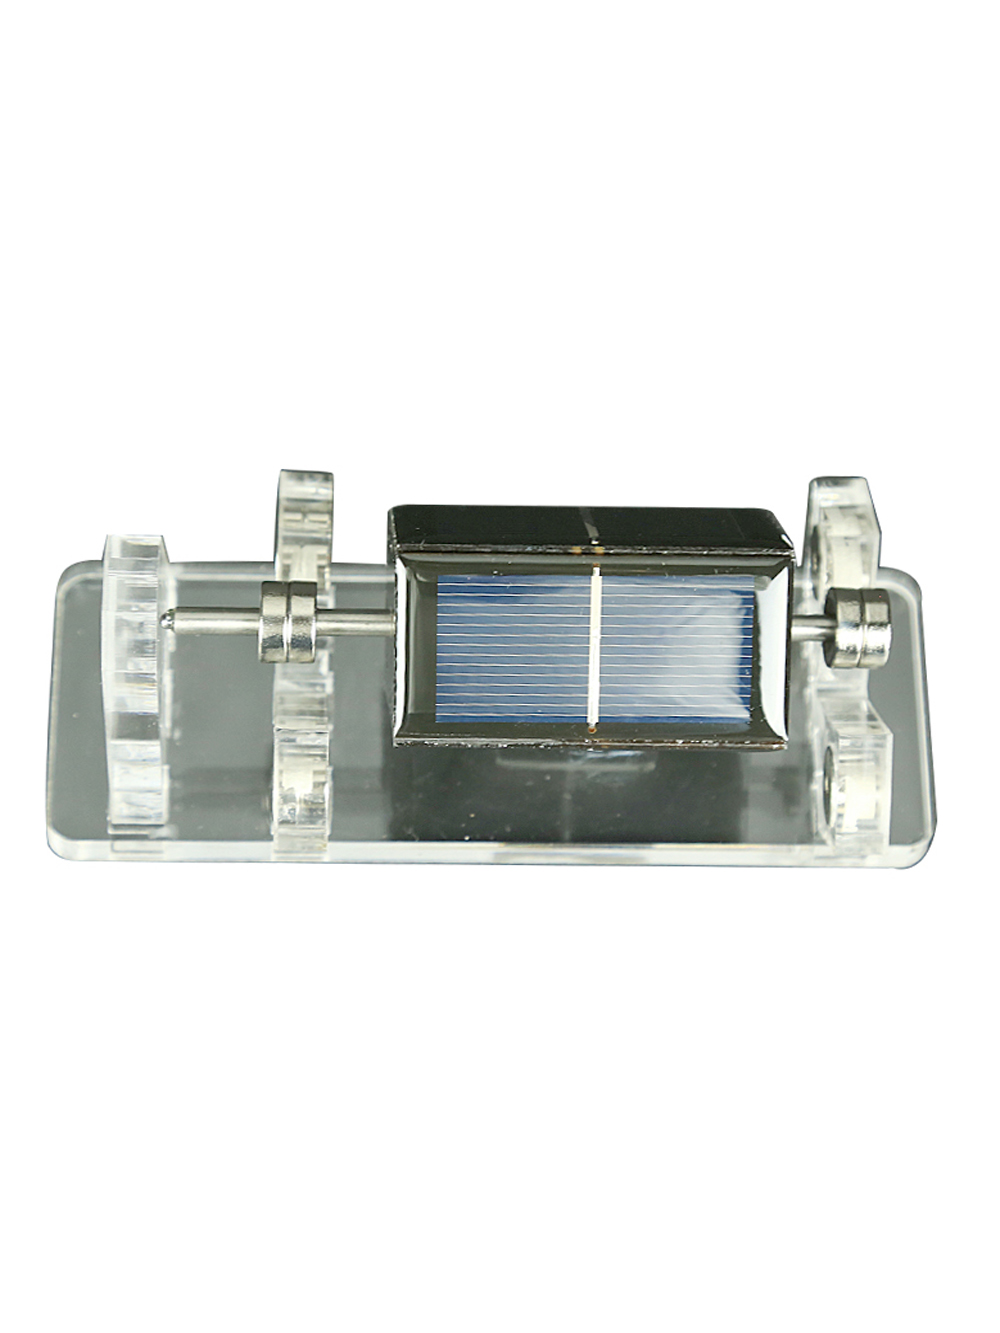 ciencia solar motor brushless do motor do motor de suspensao magnetica produtos de decoracao modelo de